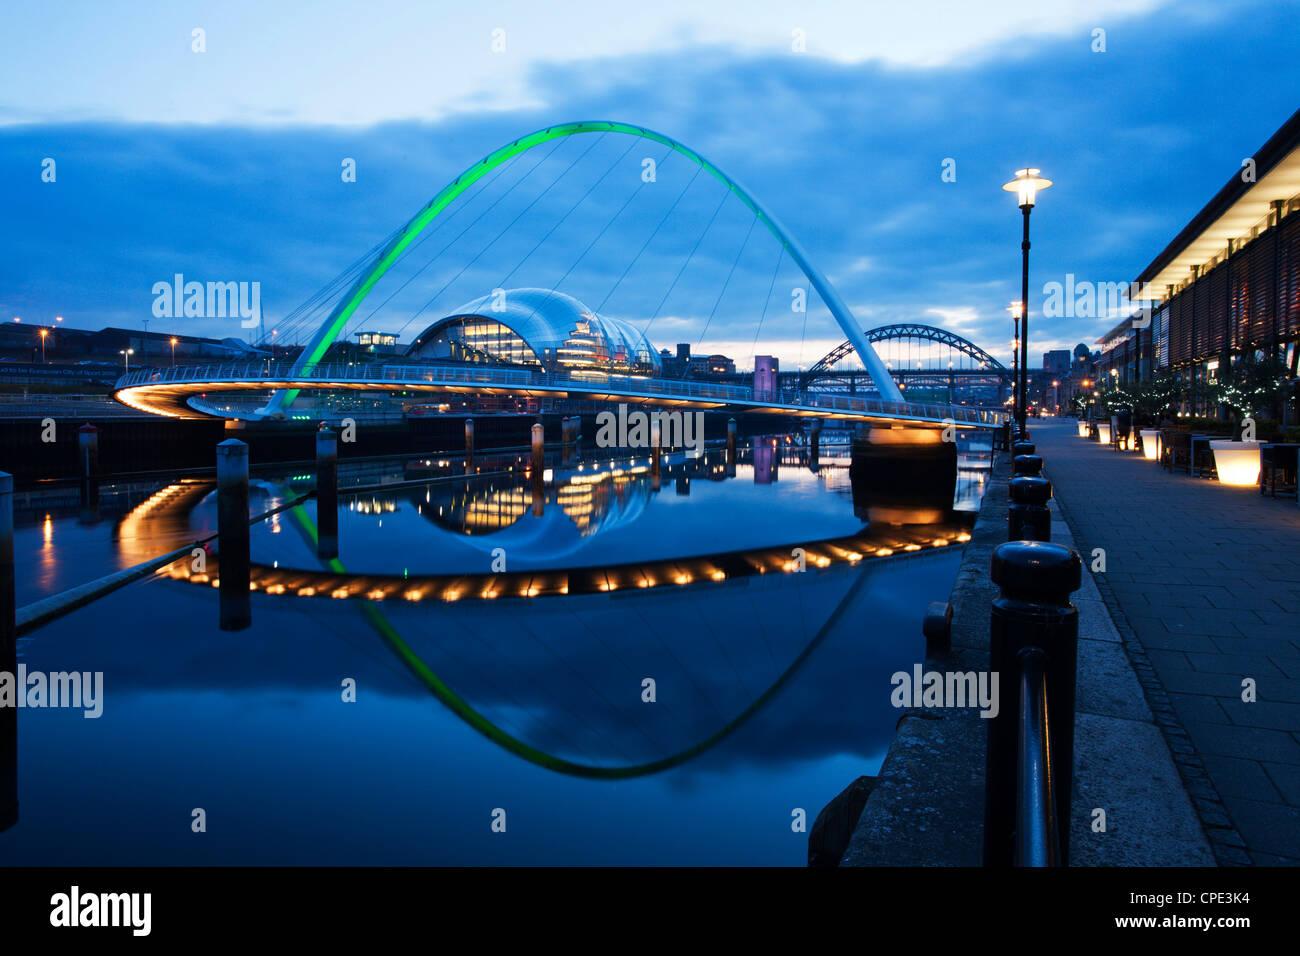 Gateshead Millennium Bridge, Tyne and Wear, England, Regno Unito Foto Stock